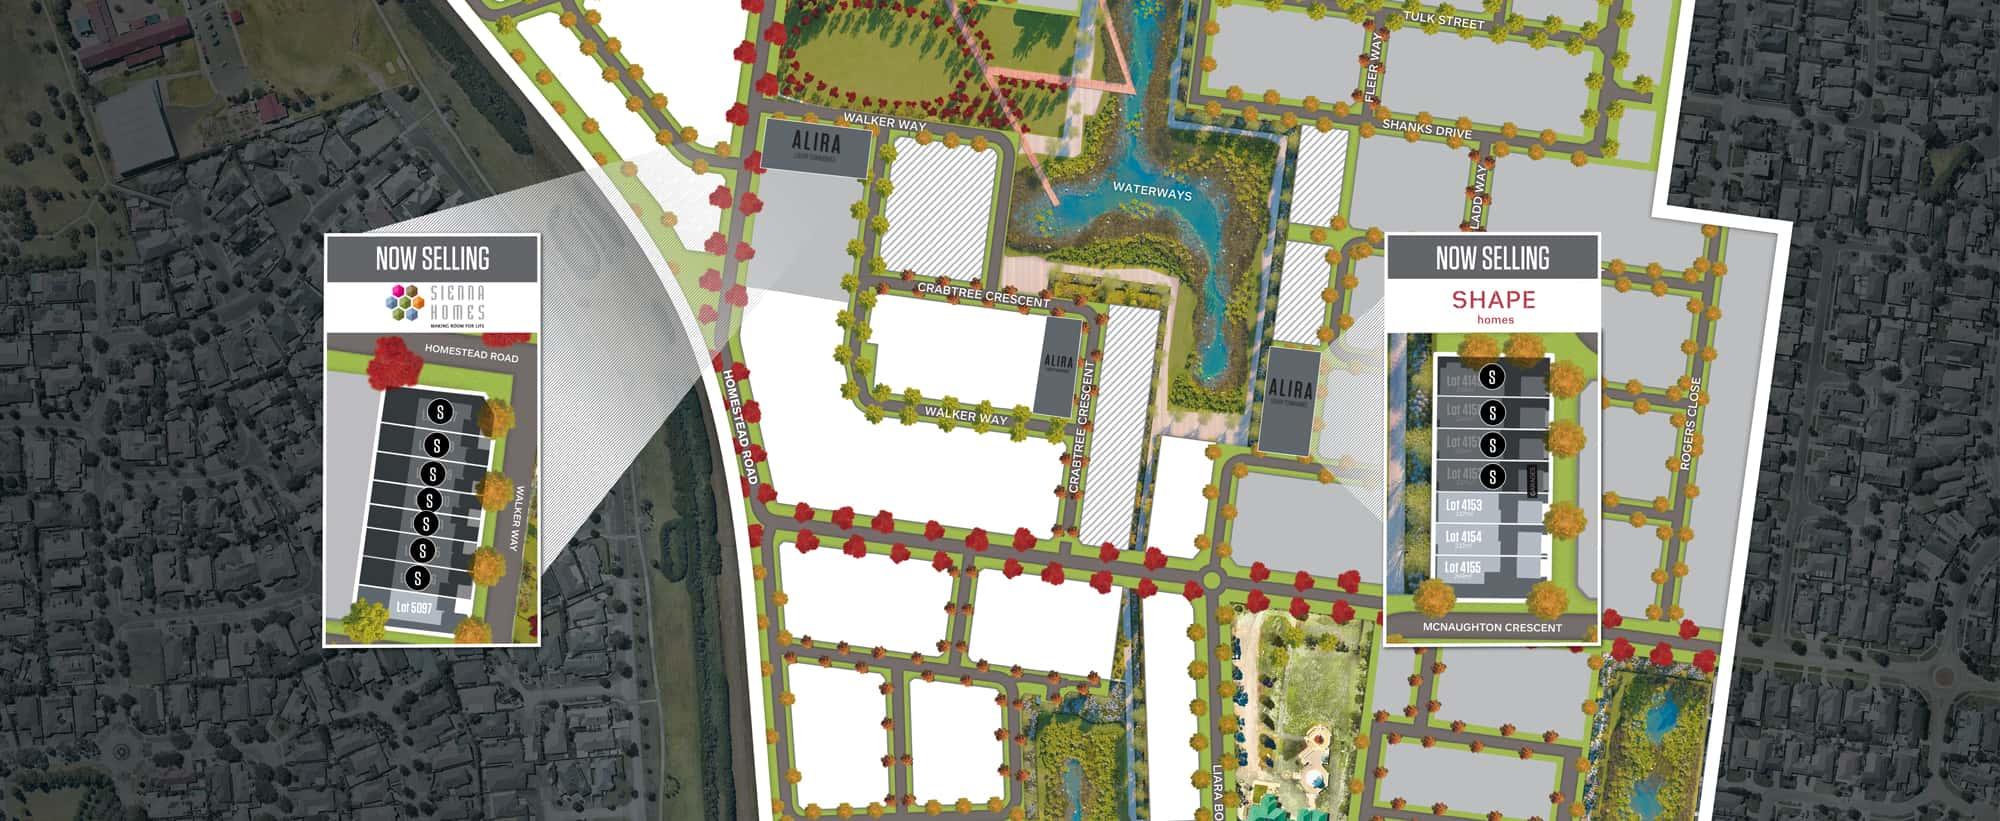 BWL22413---ALIRA---Account-Management-September-Townhomes-Page---Masterplan-Image-D01